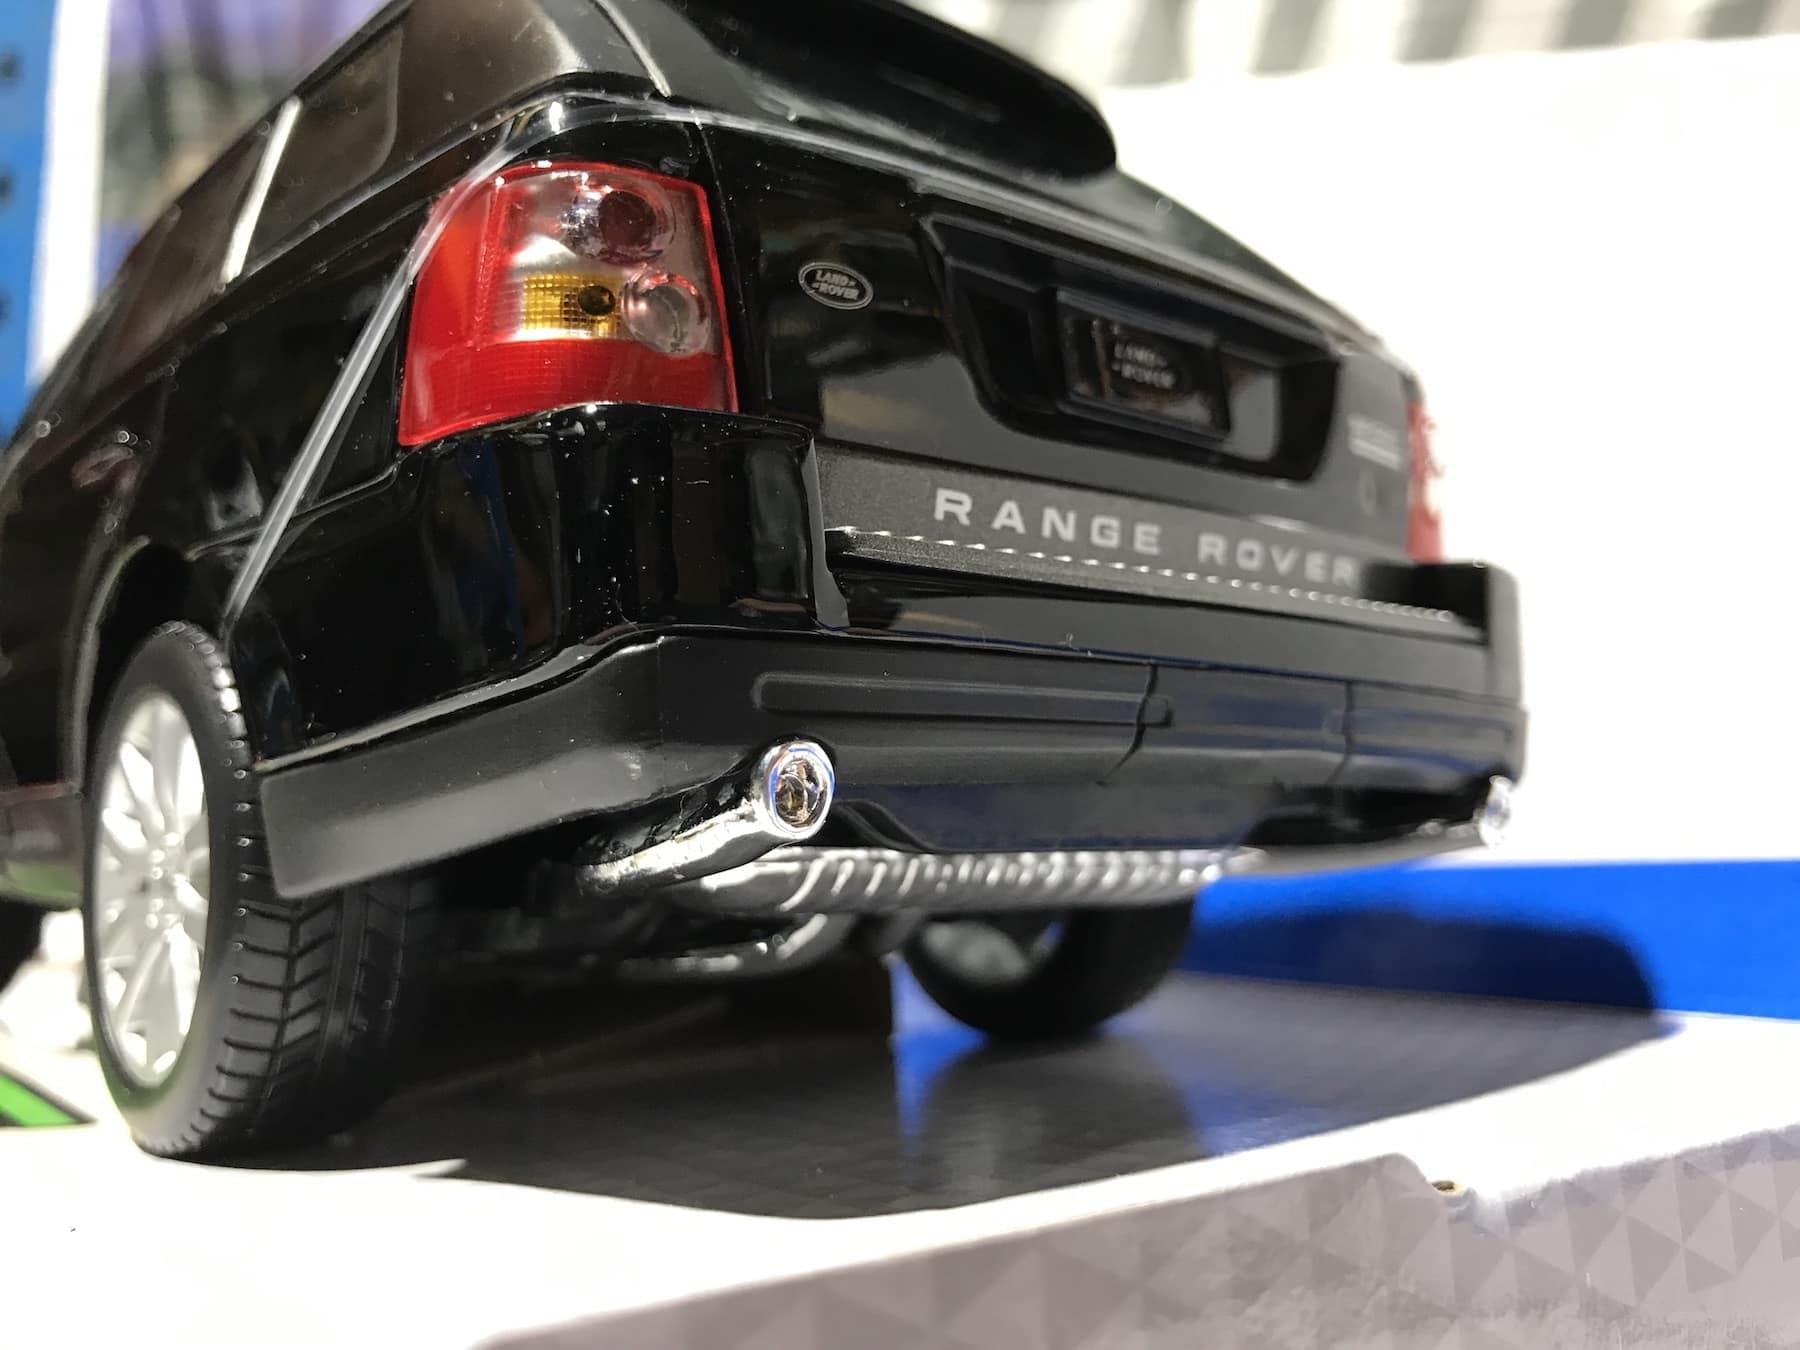 Land Rover Range Rover Sport 1:18 Scale Model Car Christmas Gift Xmas Birthday Present